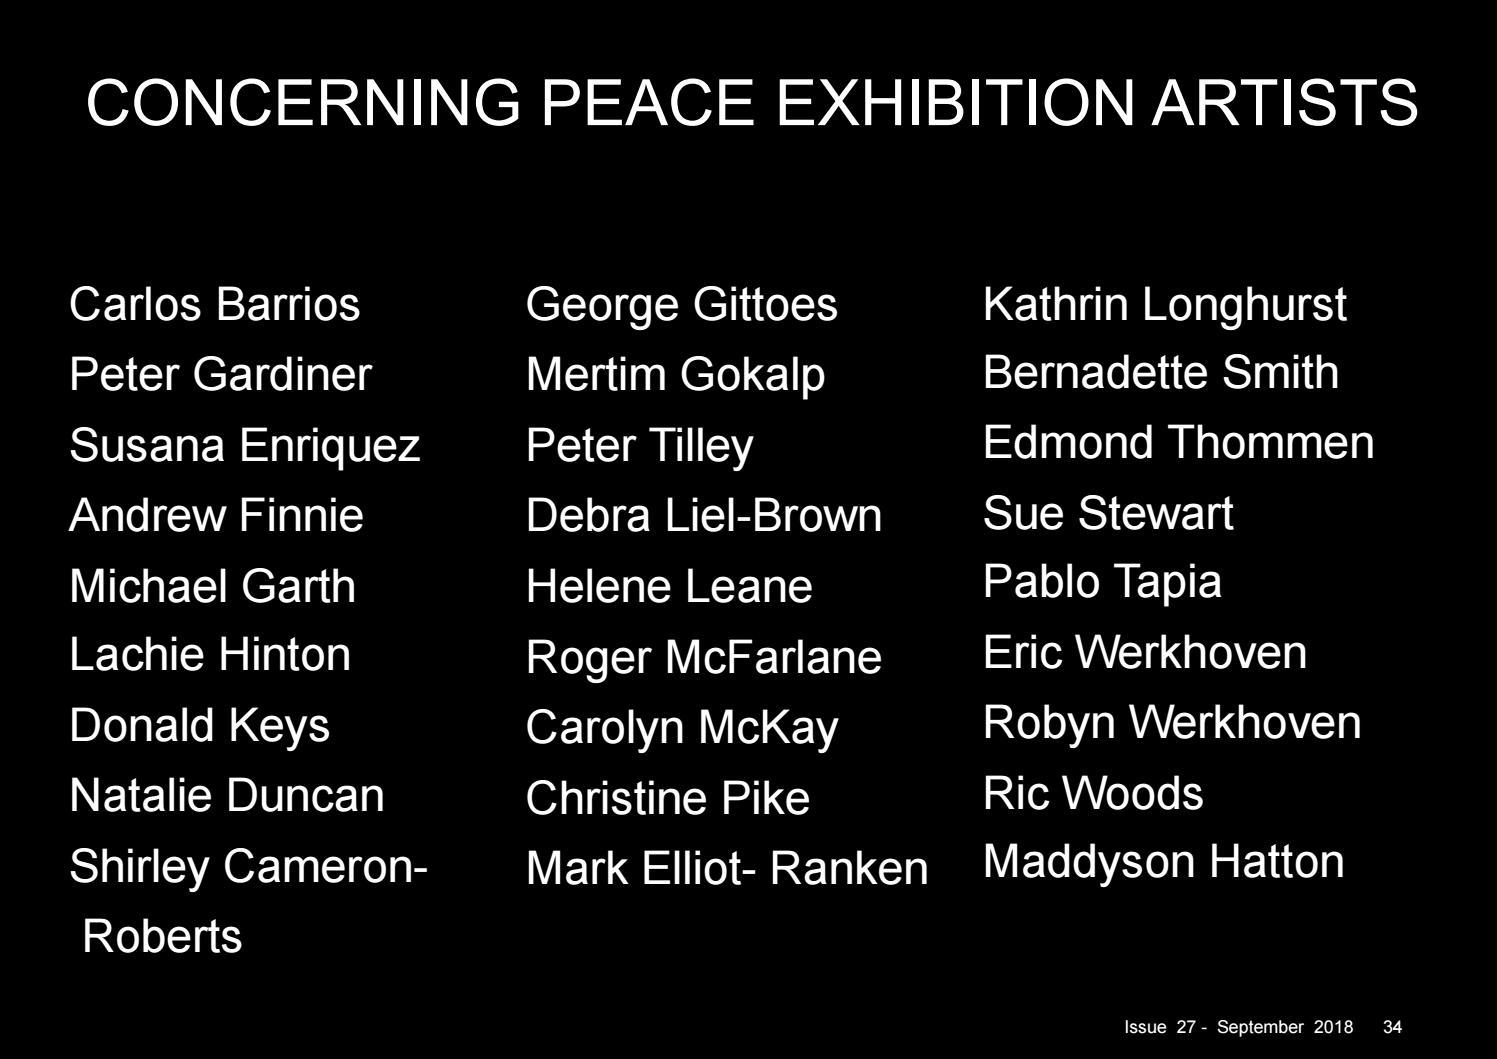 ARTS ZINE SEPTEMBER 2018